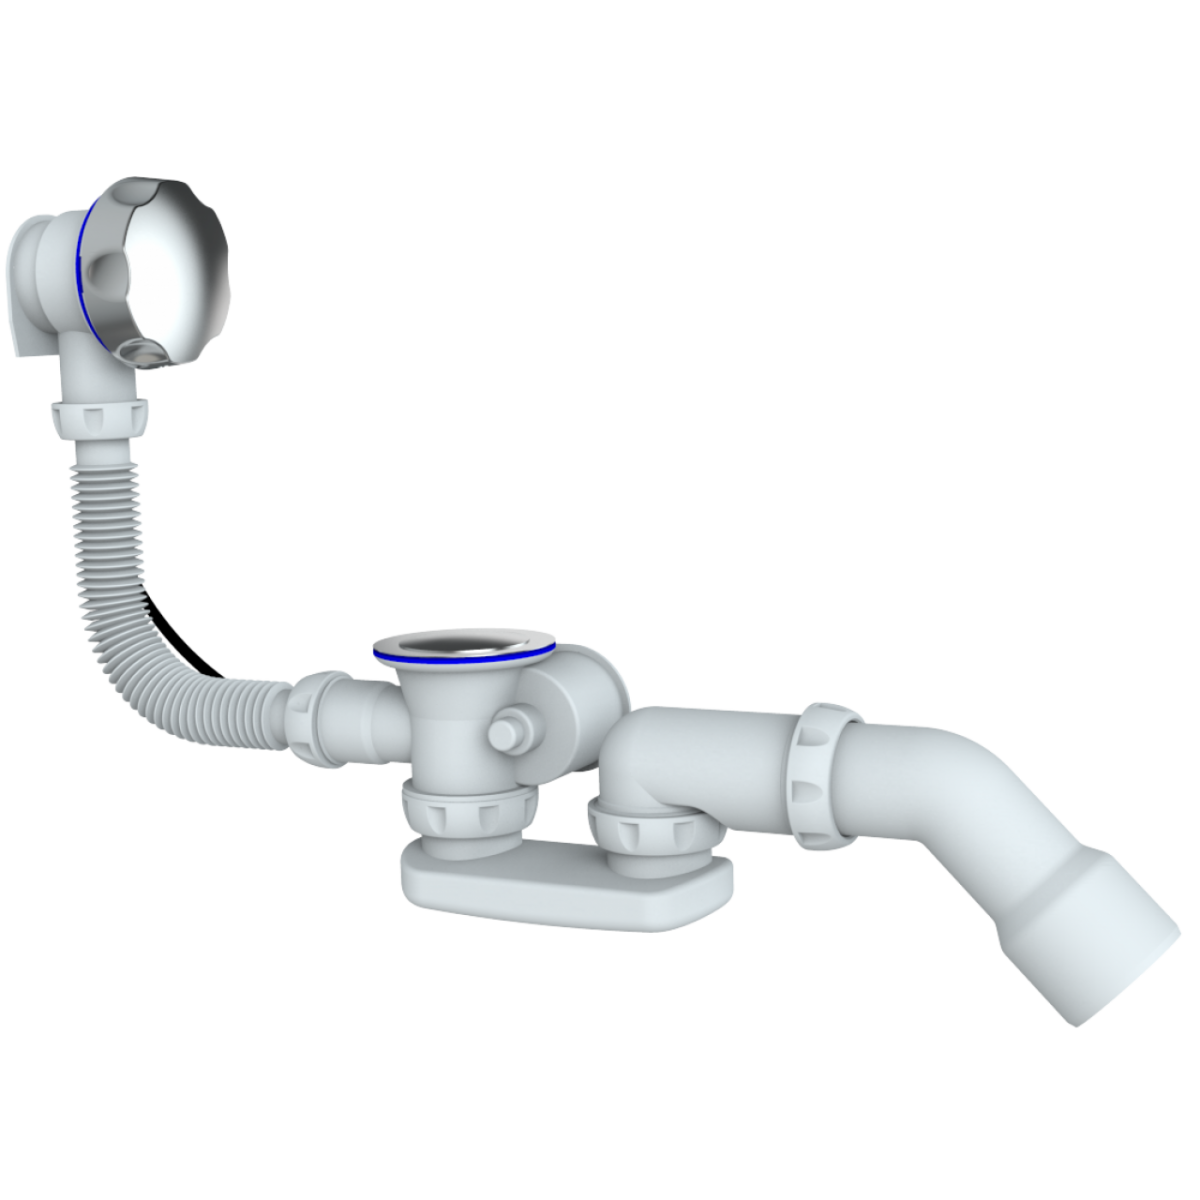 Обвязка на ванну Unicorn S101 с коленом